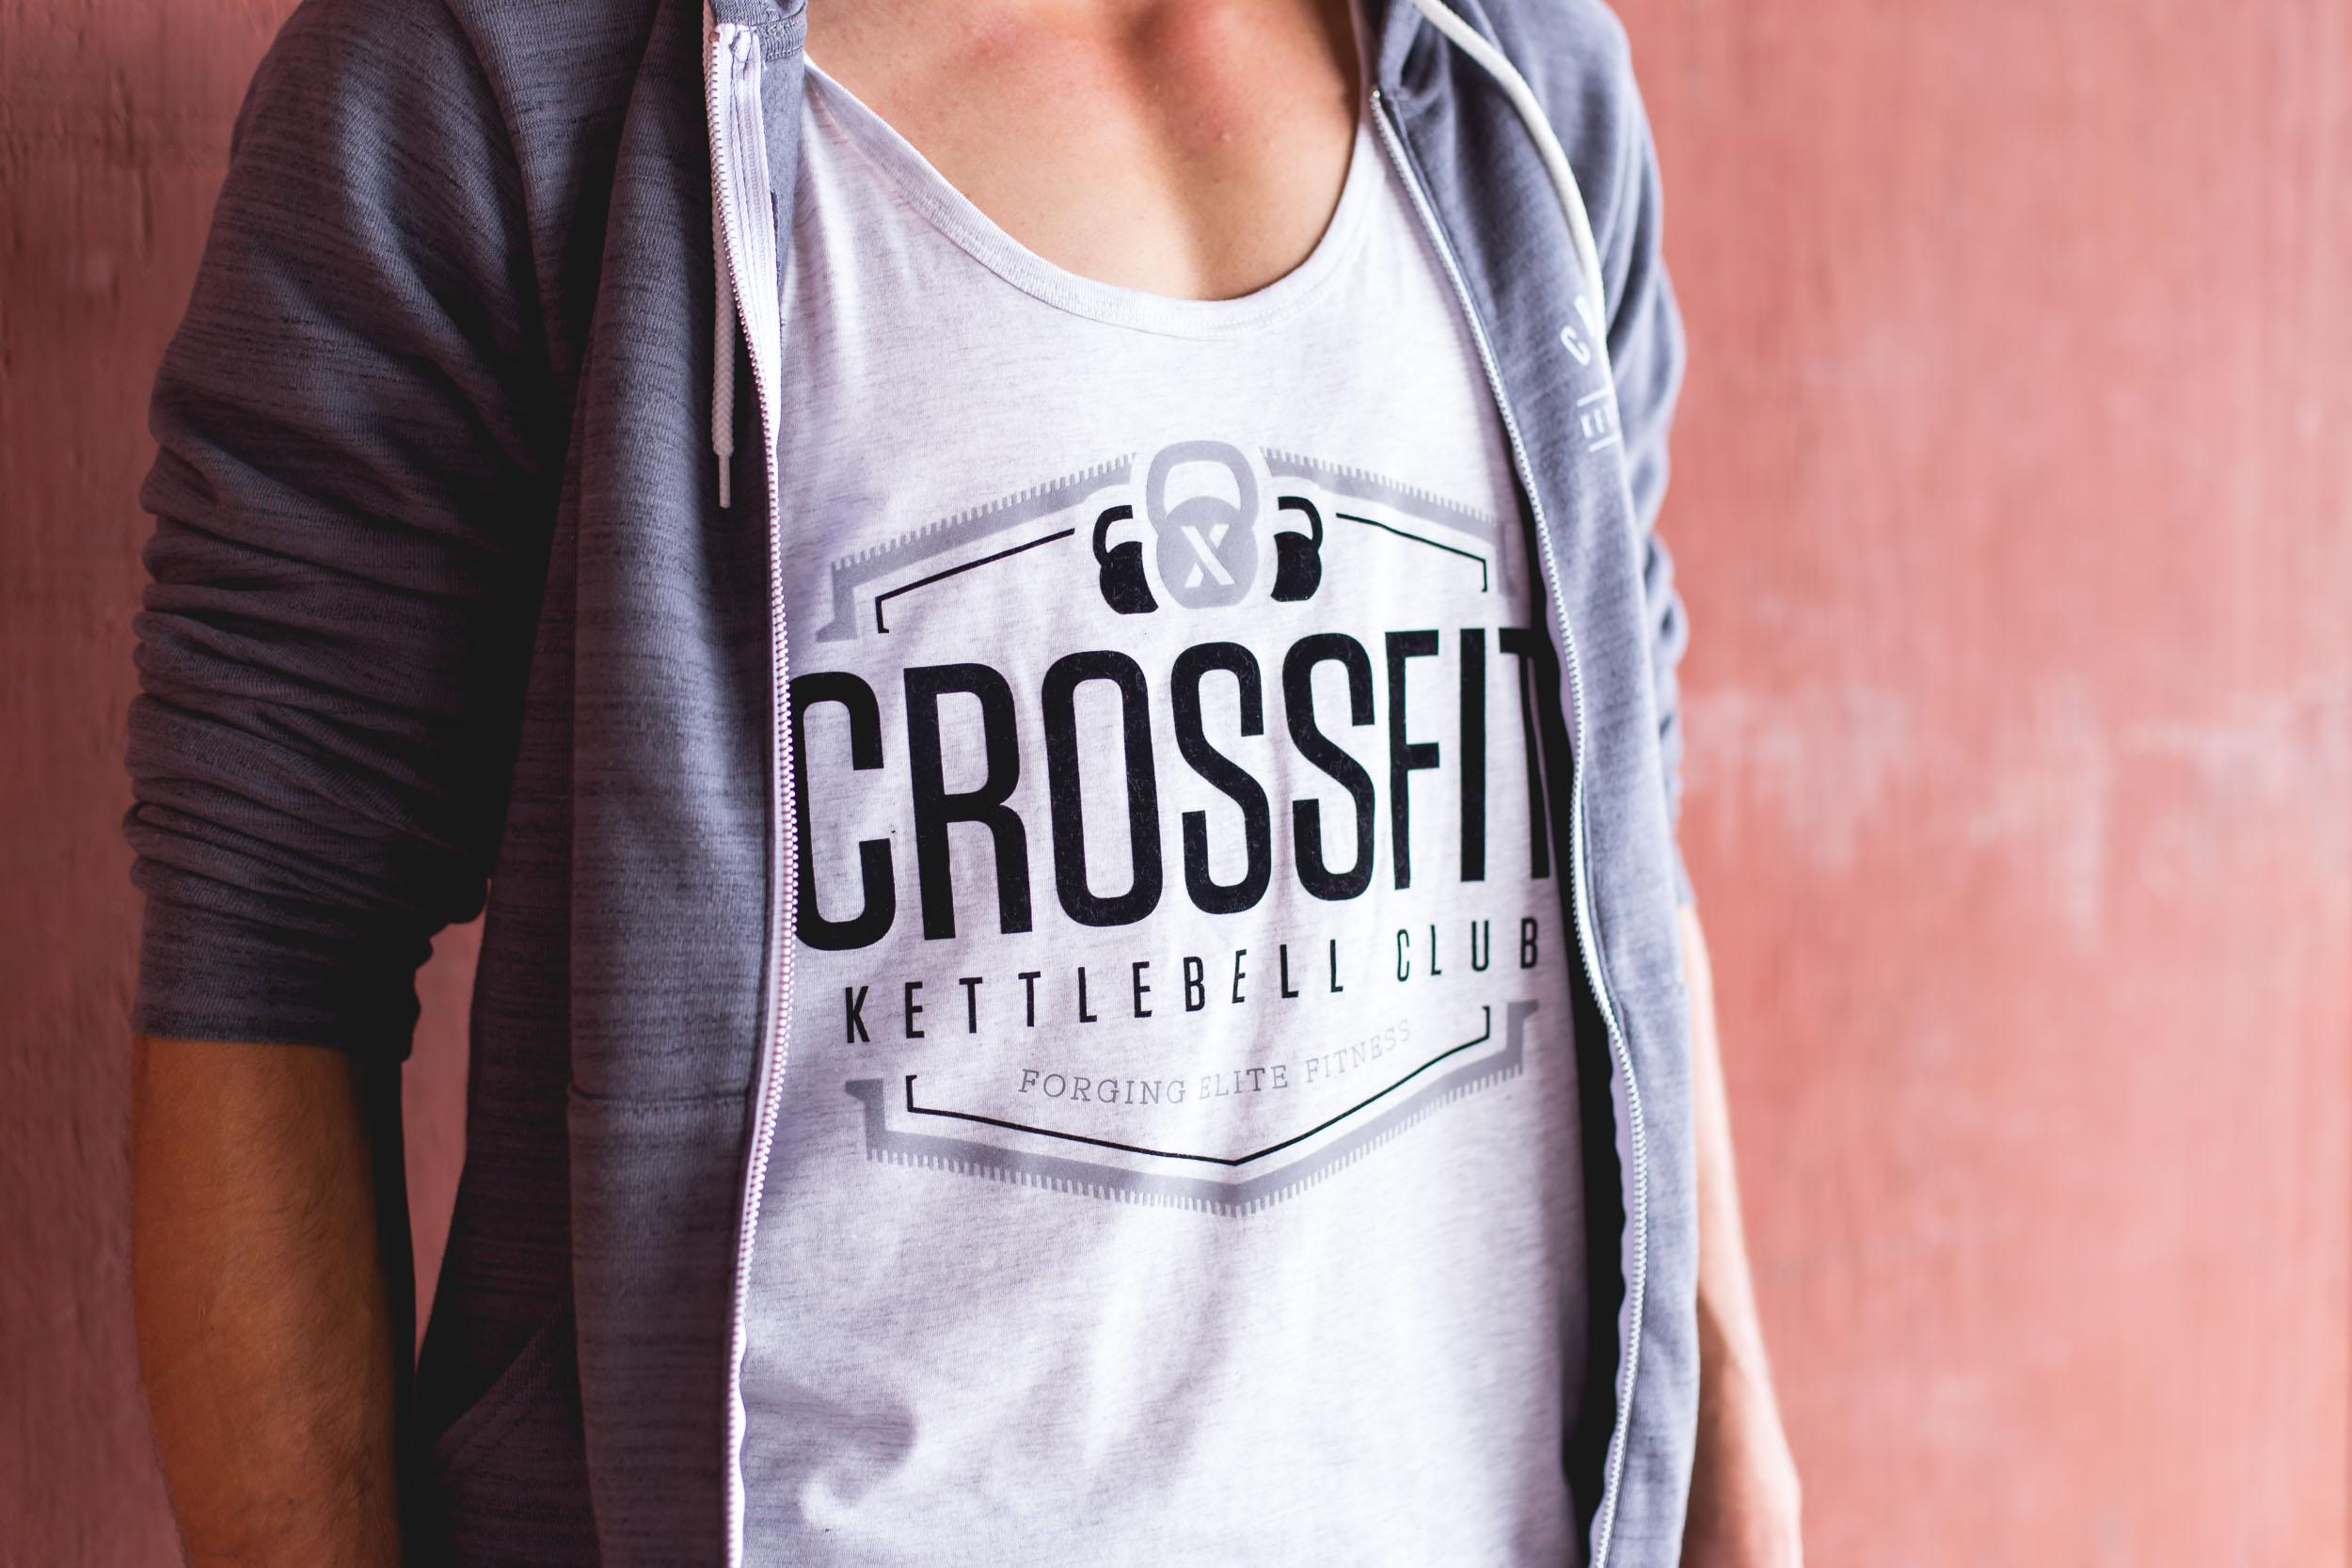 Crossfit UK printed clothing t-shirts-0143.jpg